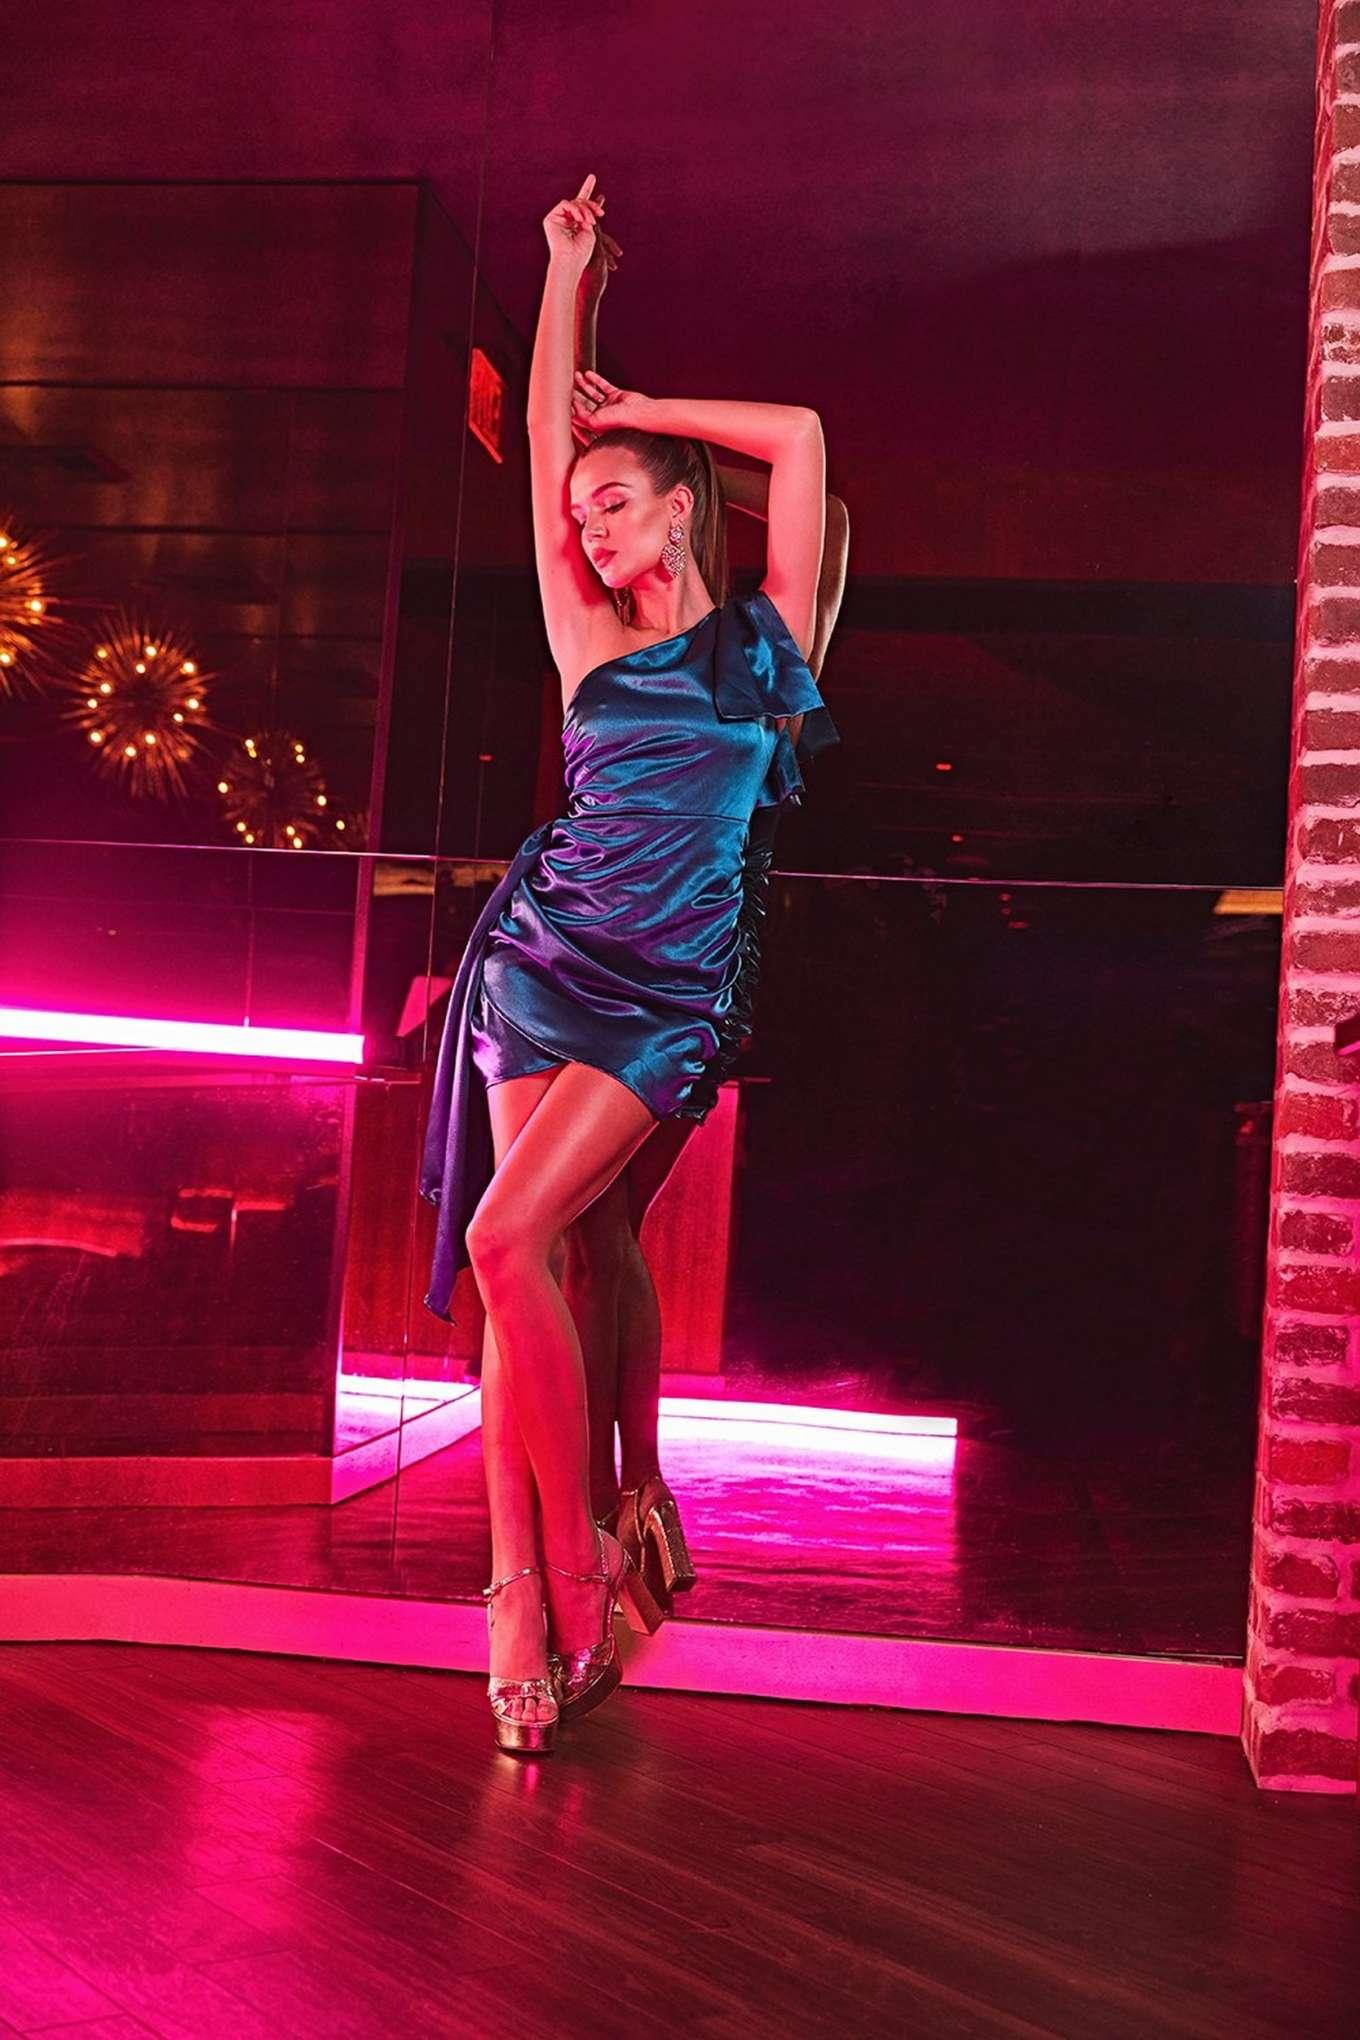 Josephine Skriver 2019 : Josephine Skriver – All That Glitters Holiday Boohoo Campaign 2019-04